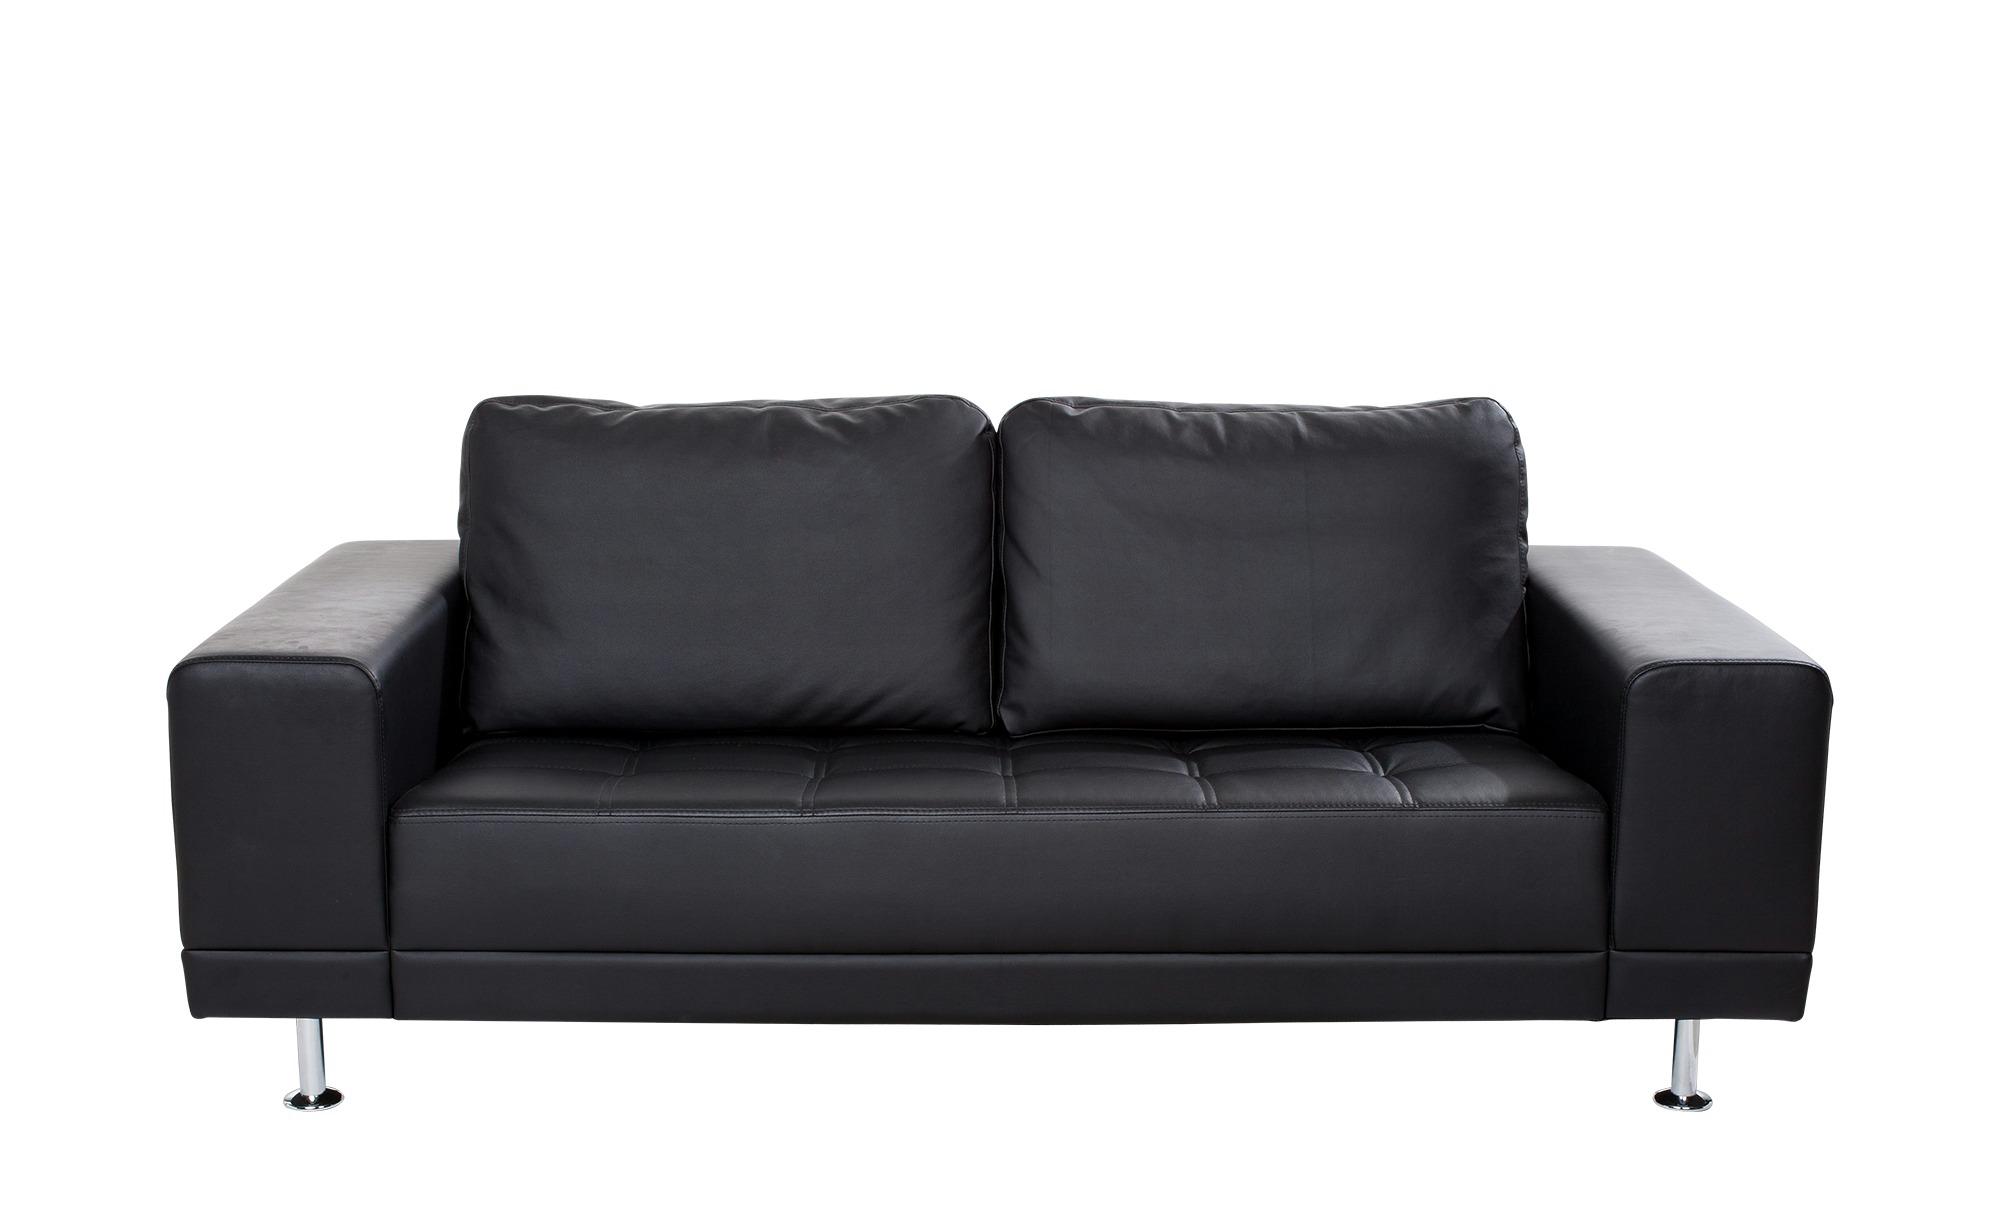 Schwarz Schwarzes Breite200 Cm Design Sofa Smart Höhe85 Garda l1KFcTJ